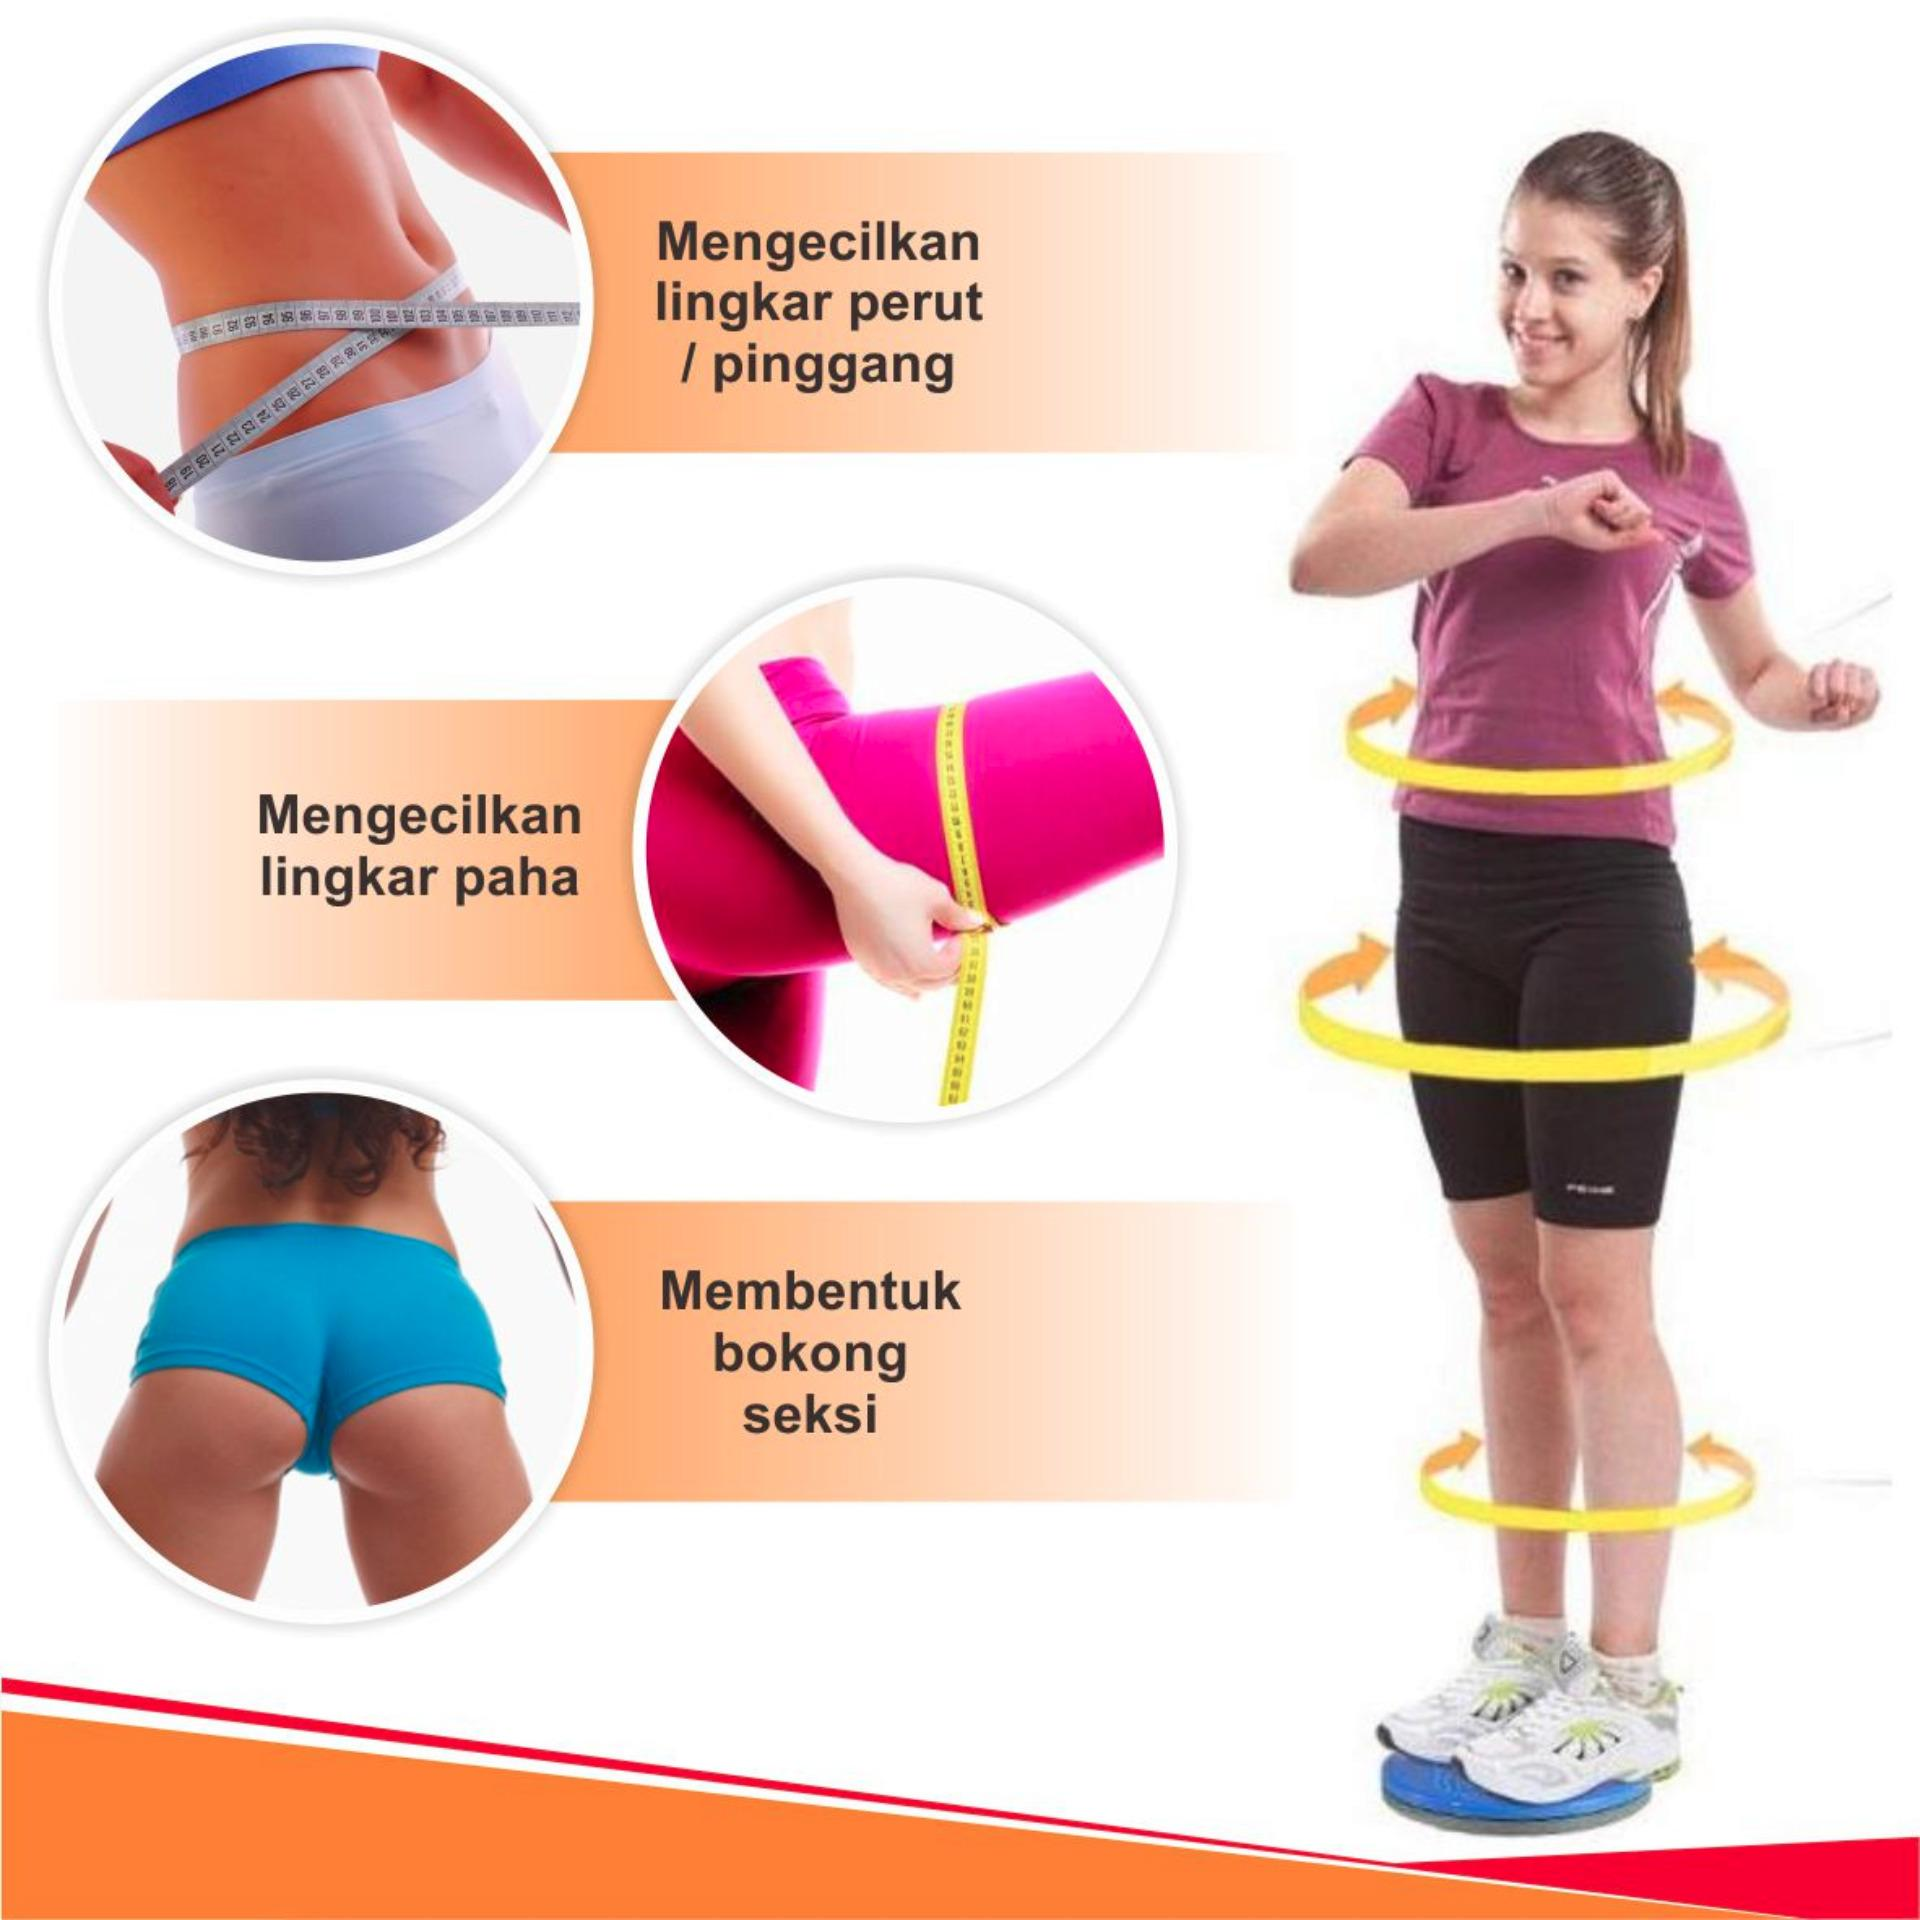 Weitech Peralatan Olahraga Pinggul Waist Twisting Alat Pelangsing Tubuh Pinggul Disc 1012 Lazada Indonesia